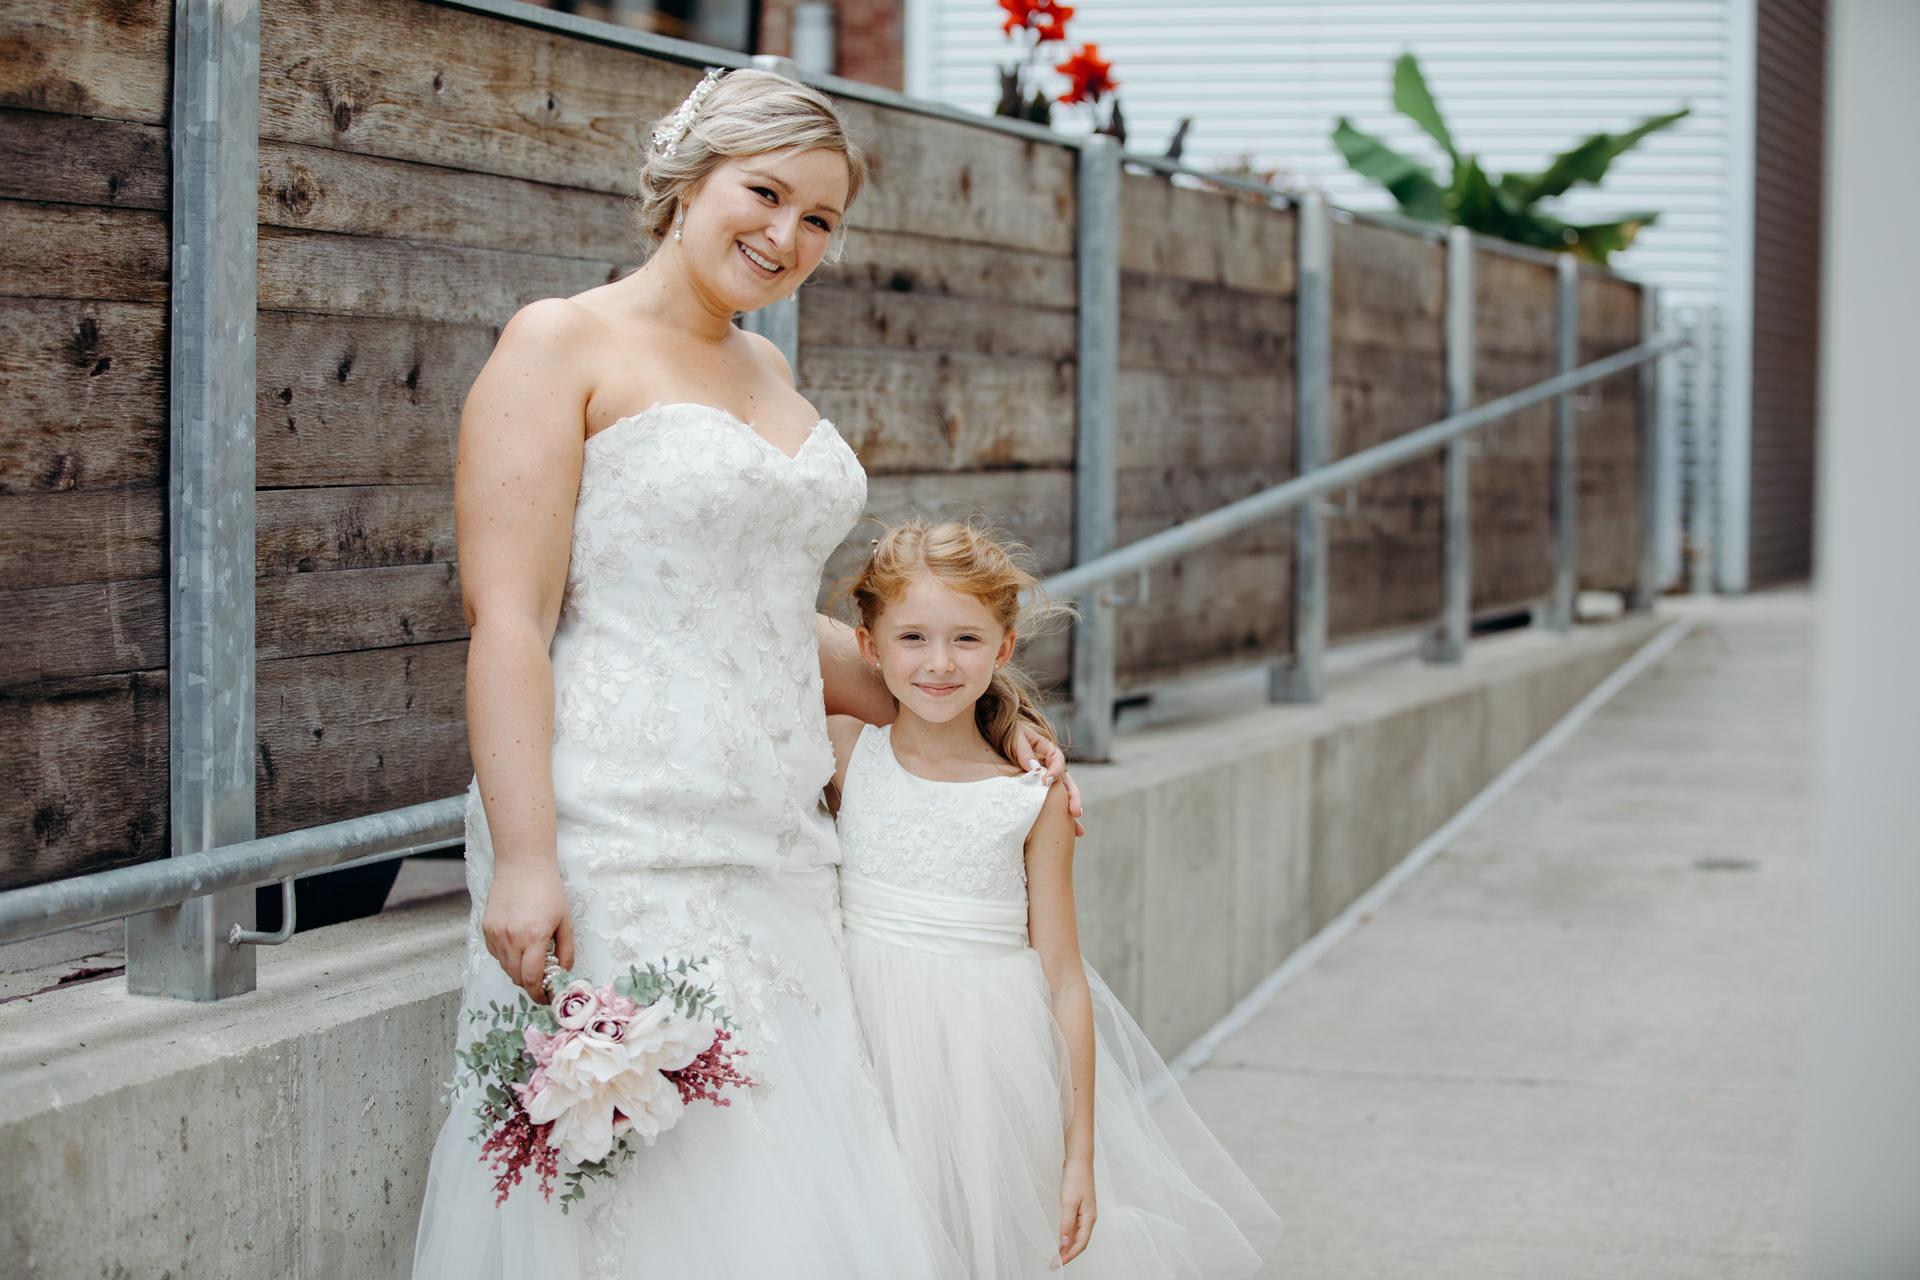 Grant Beachy Weddings photography elkhart south bend goshen warsaw-027.jpg